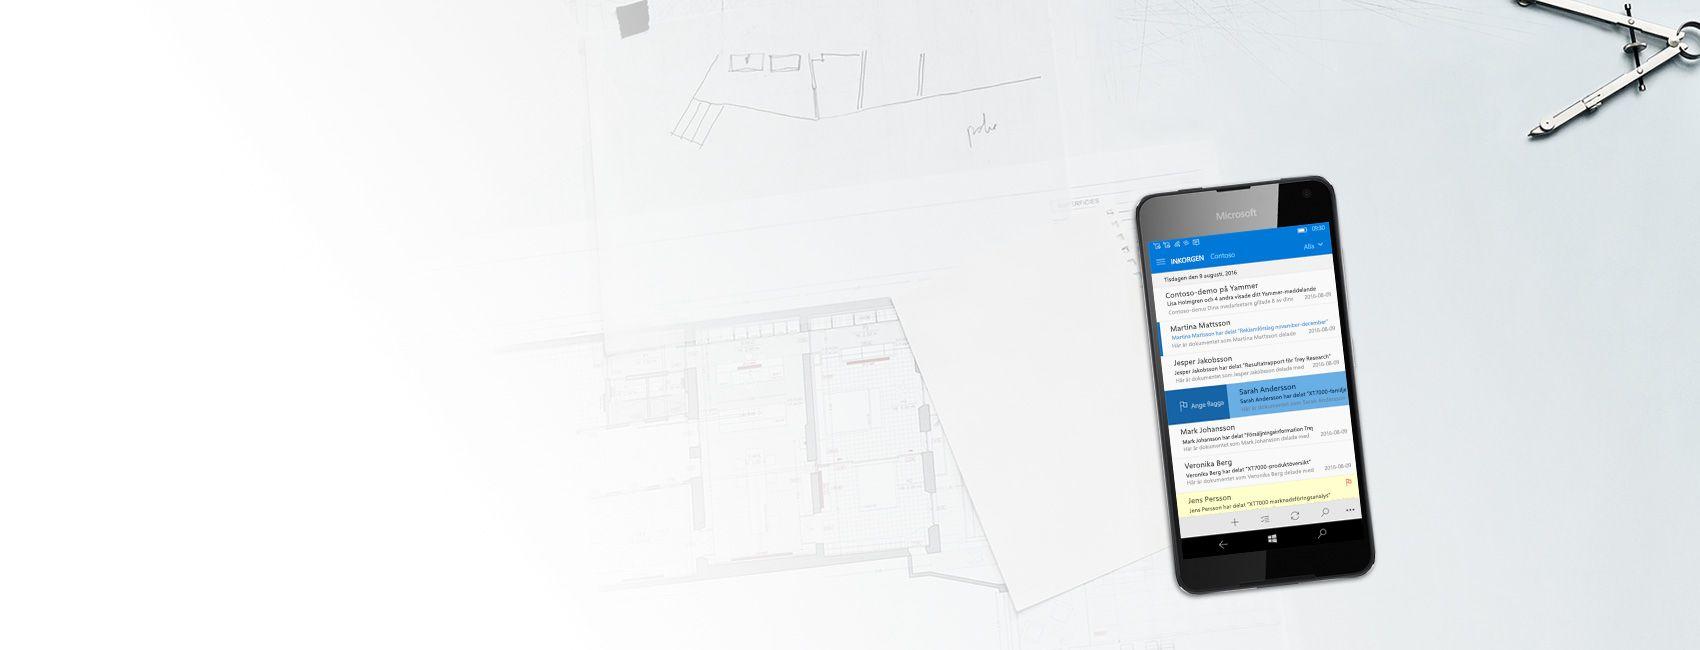 Windows-telefon med en inkorg i Outlook för Windows 10 Mobile